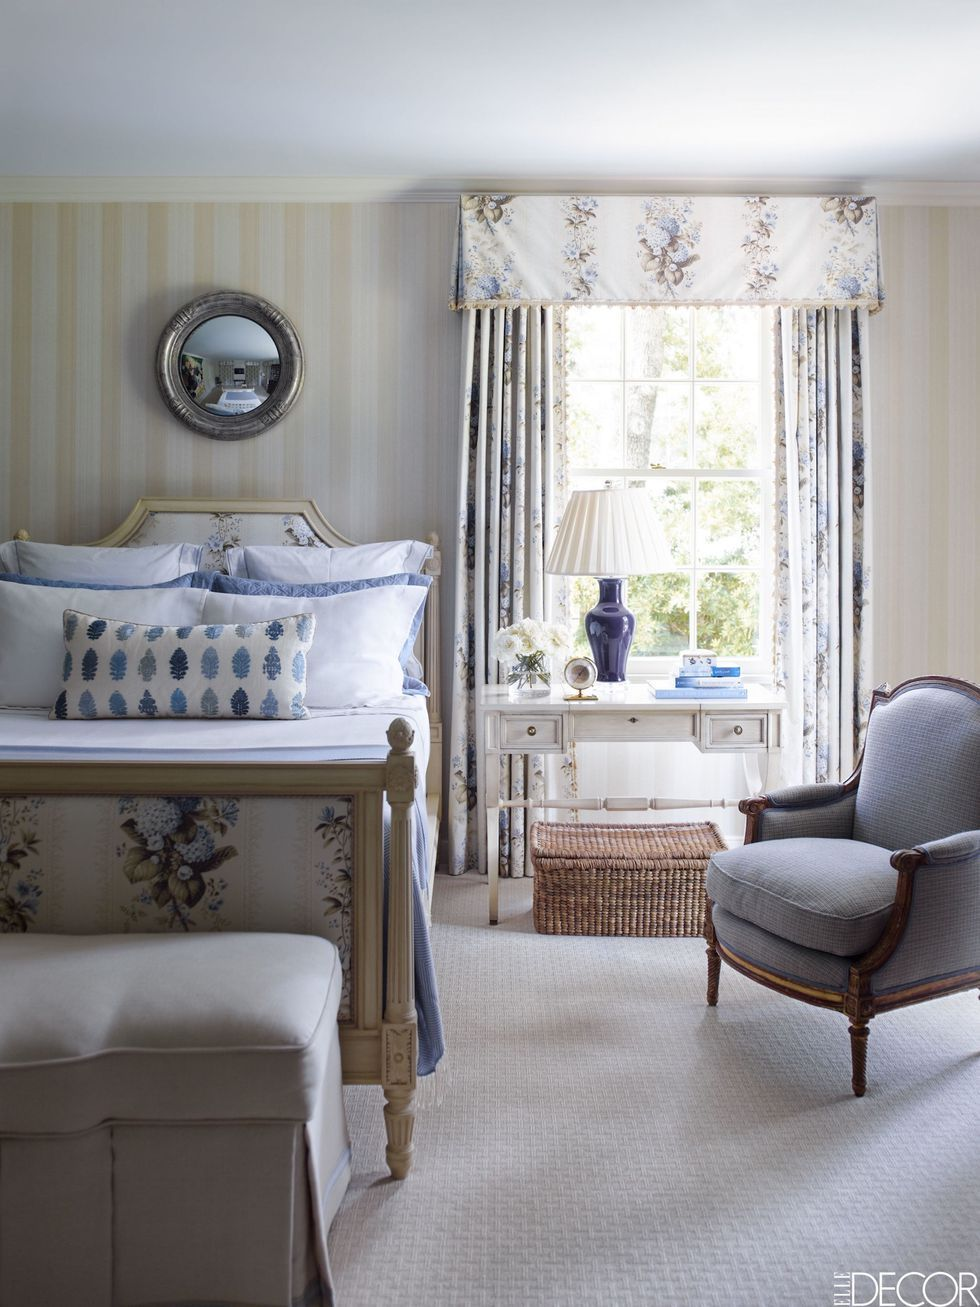 Best Bedroom Curtains - Ideas for Bedroom Window Treatments on Master Bedroom Curtain Ideas  id=27537